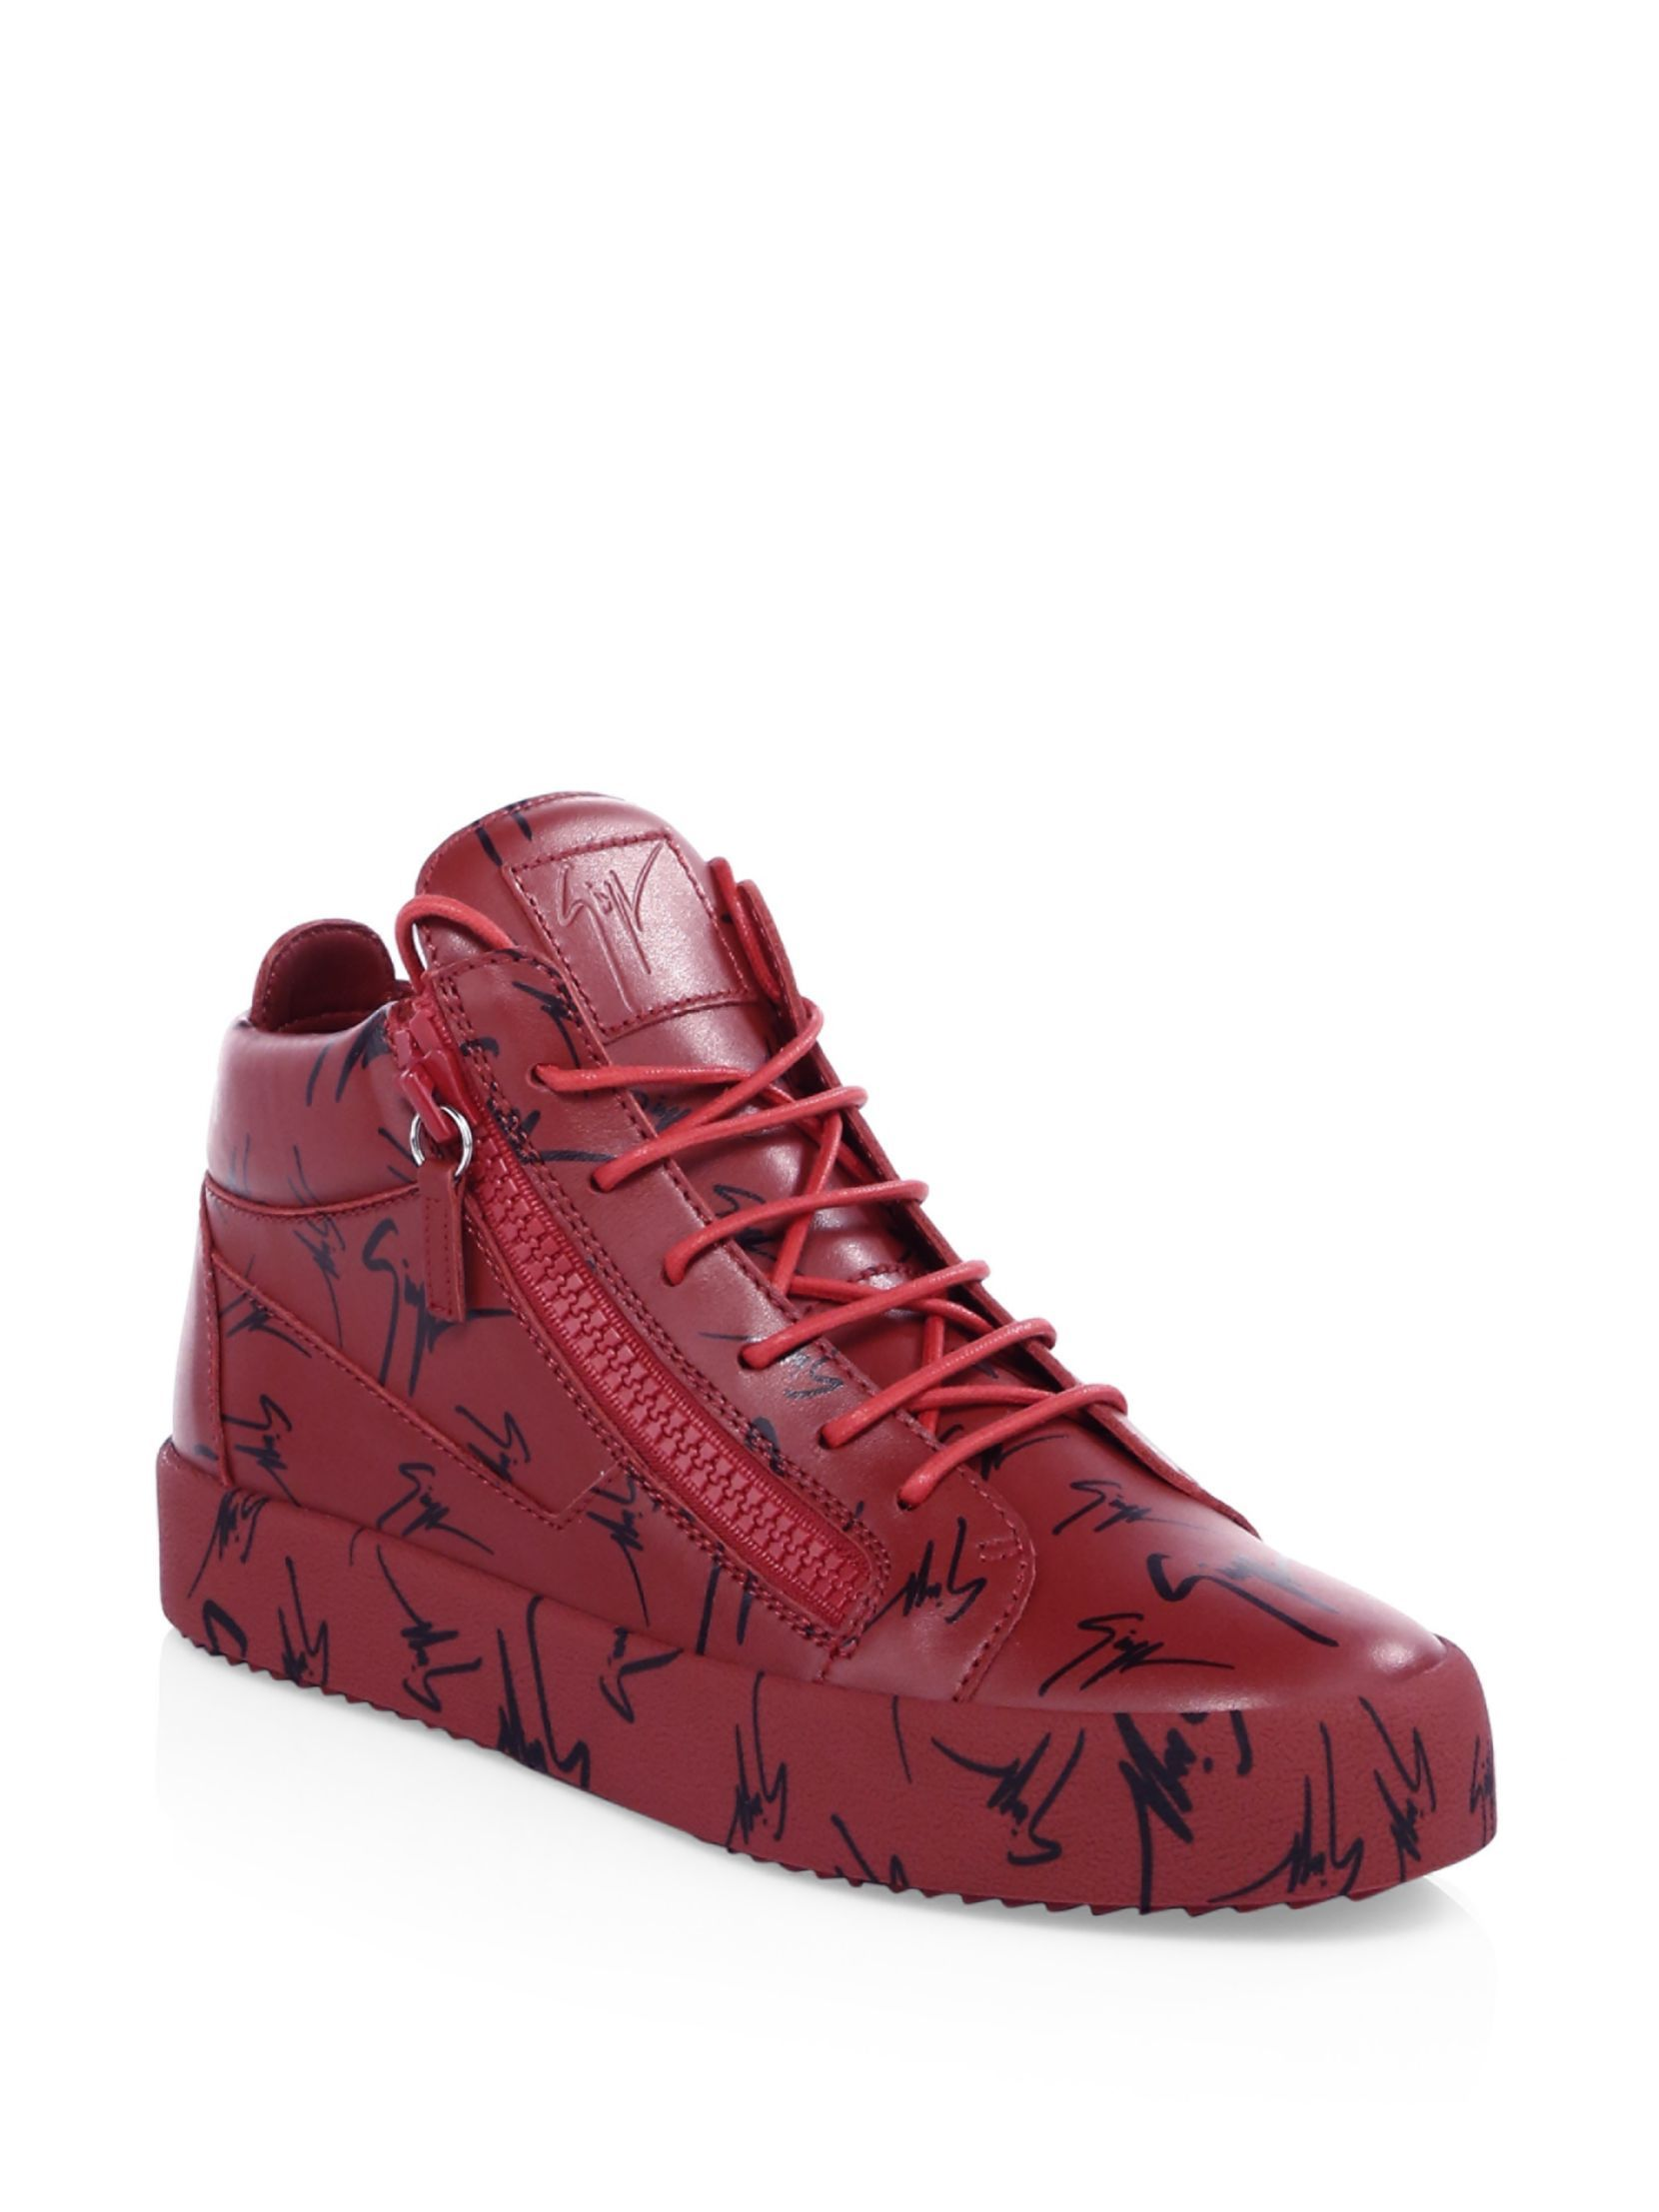 3435c9998dce Giuseppe Zanotti Logo Leather Platform Sneakers Platform Sneakers